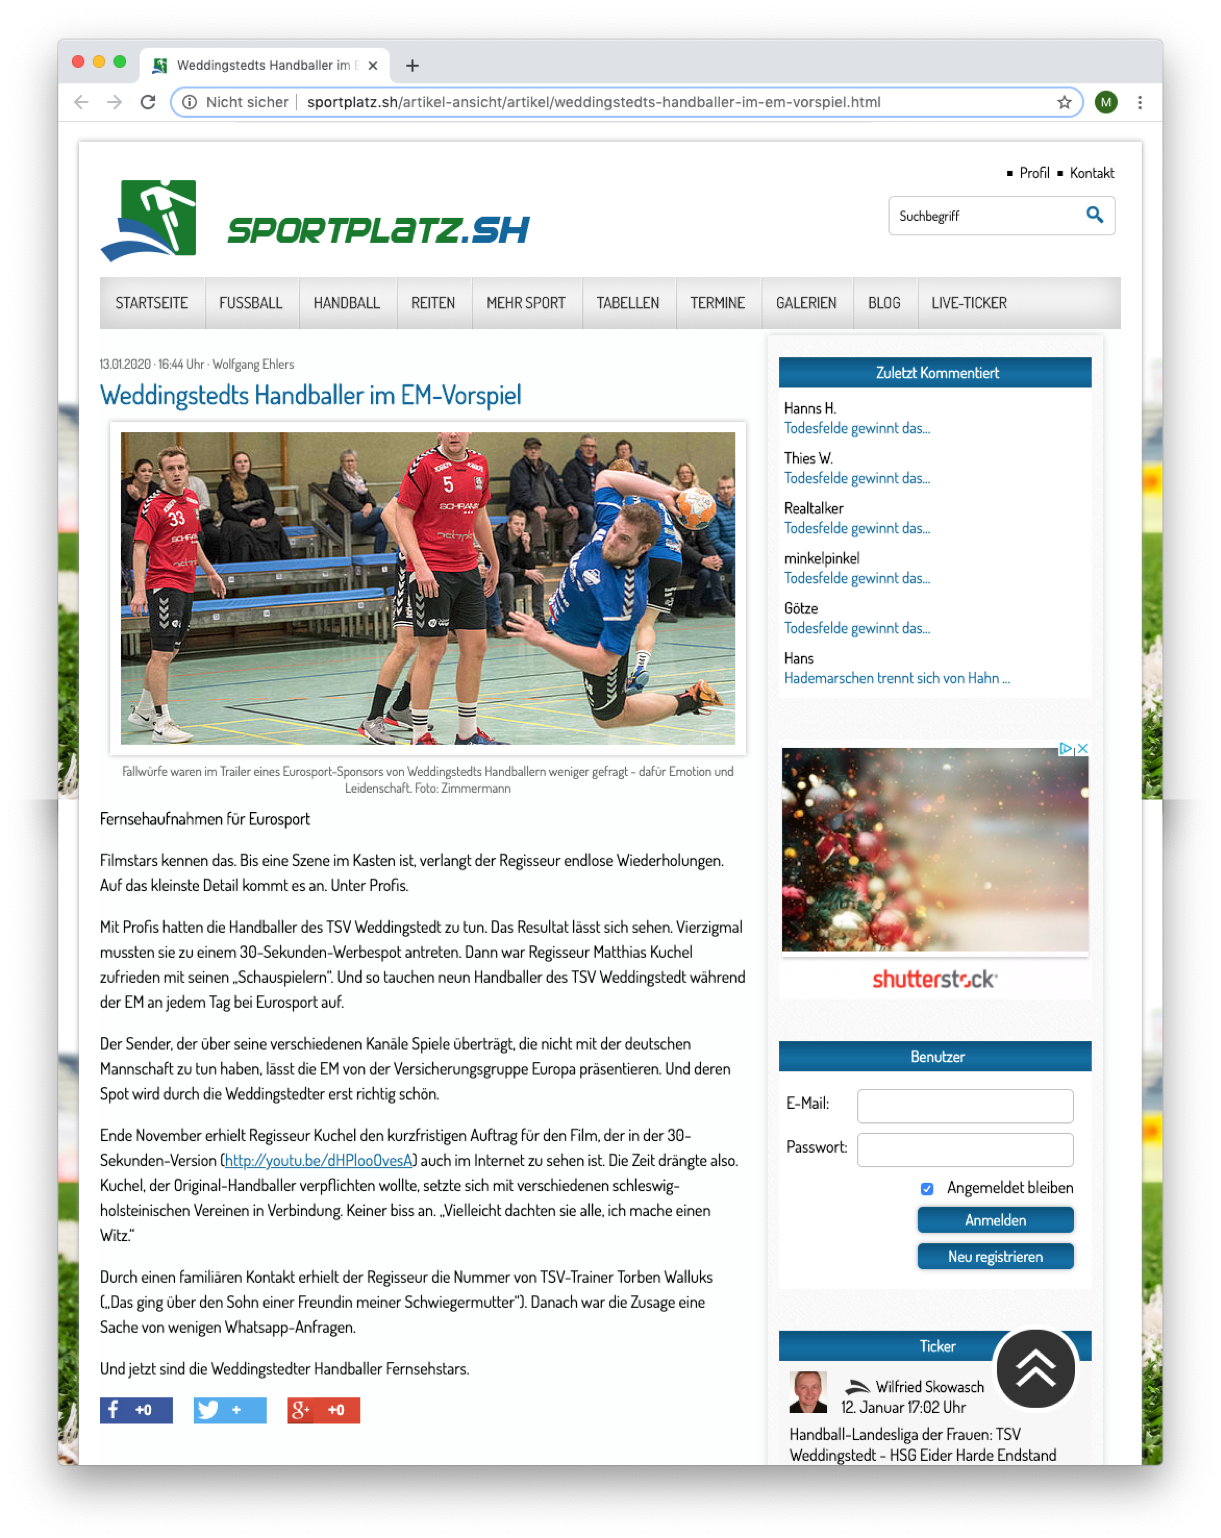 Sportplatz.SH